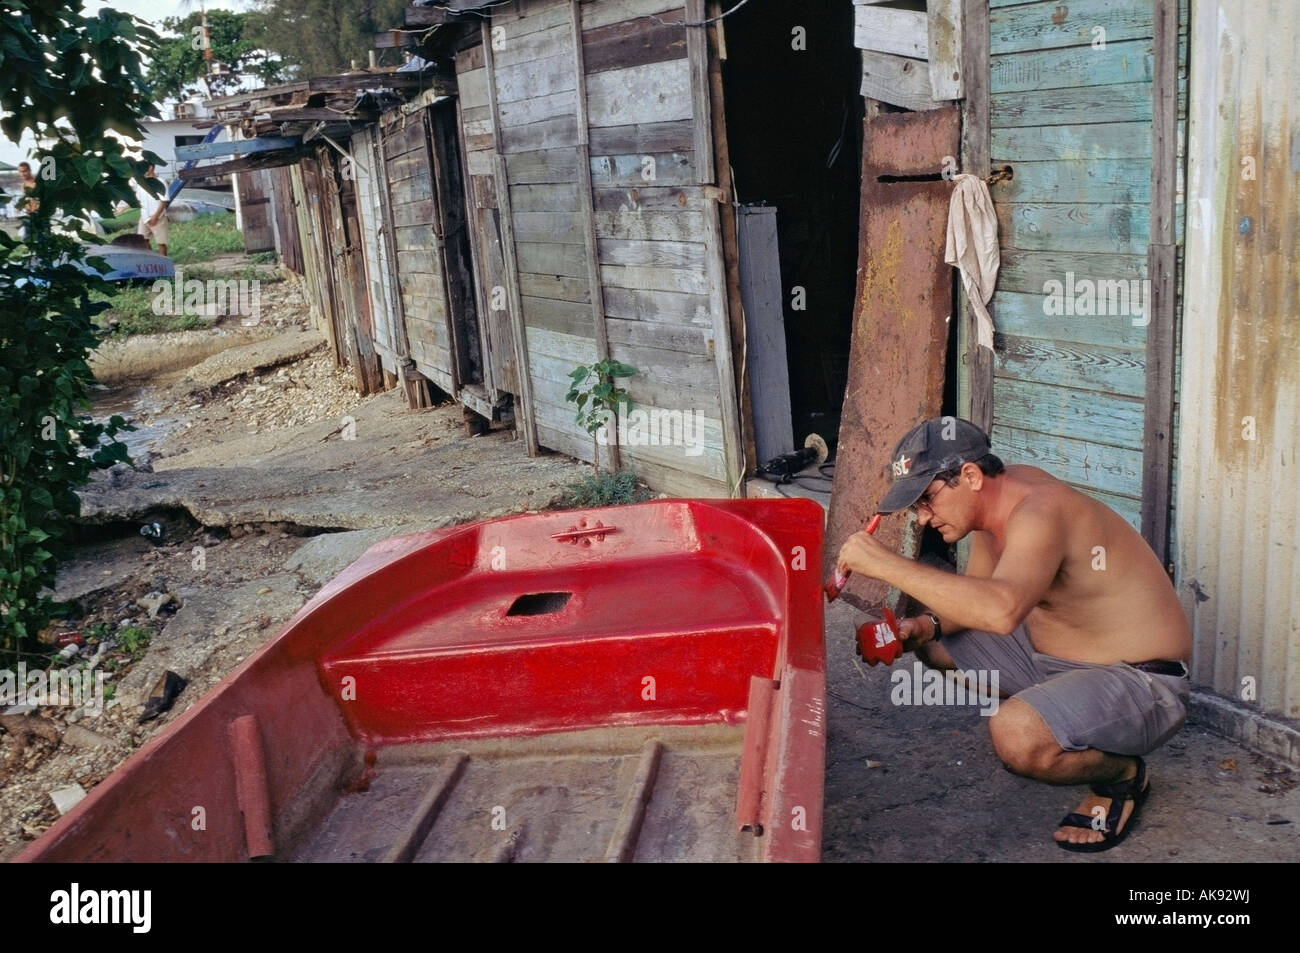 Fisherman painting boat red by the Rio Almendares in Mirimar Havana Cuba Stock Photo